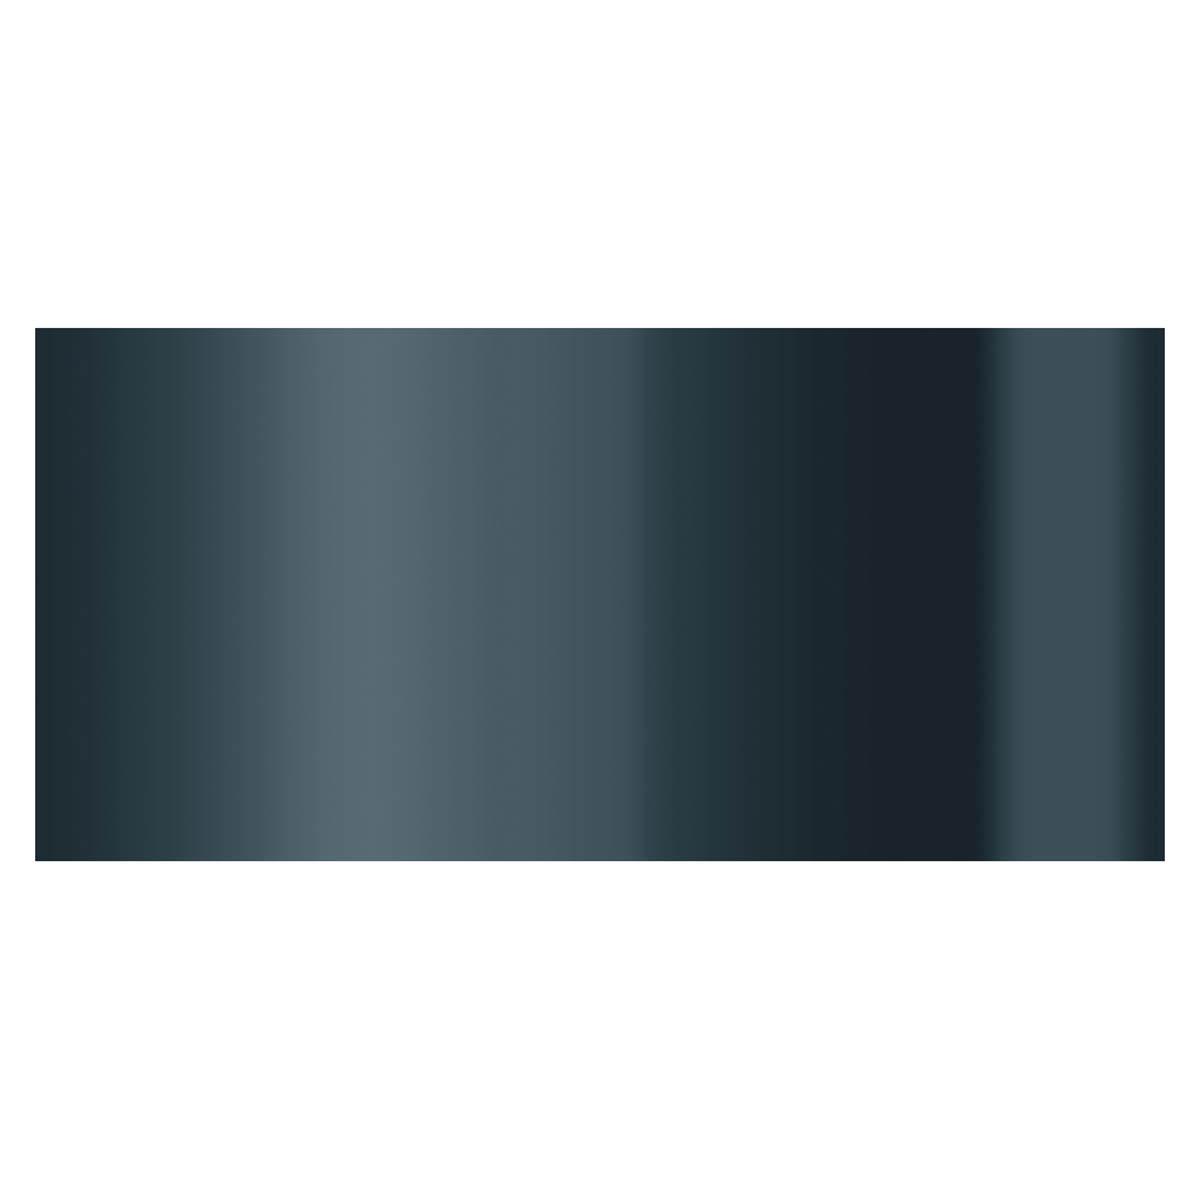 Waverly ® Inspirations Metallic Multi-Surface Acrylic Paint - Black Opal, 2 oz. - 60927E